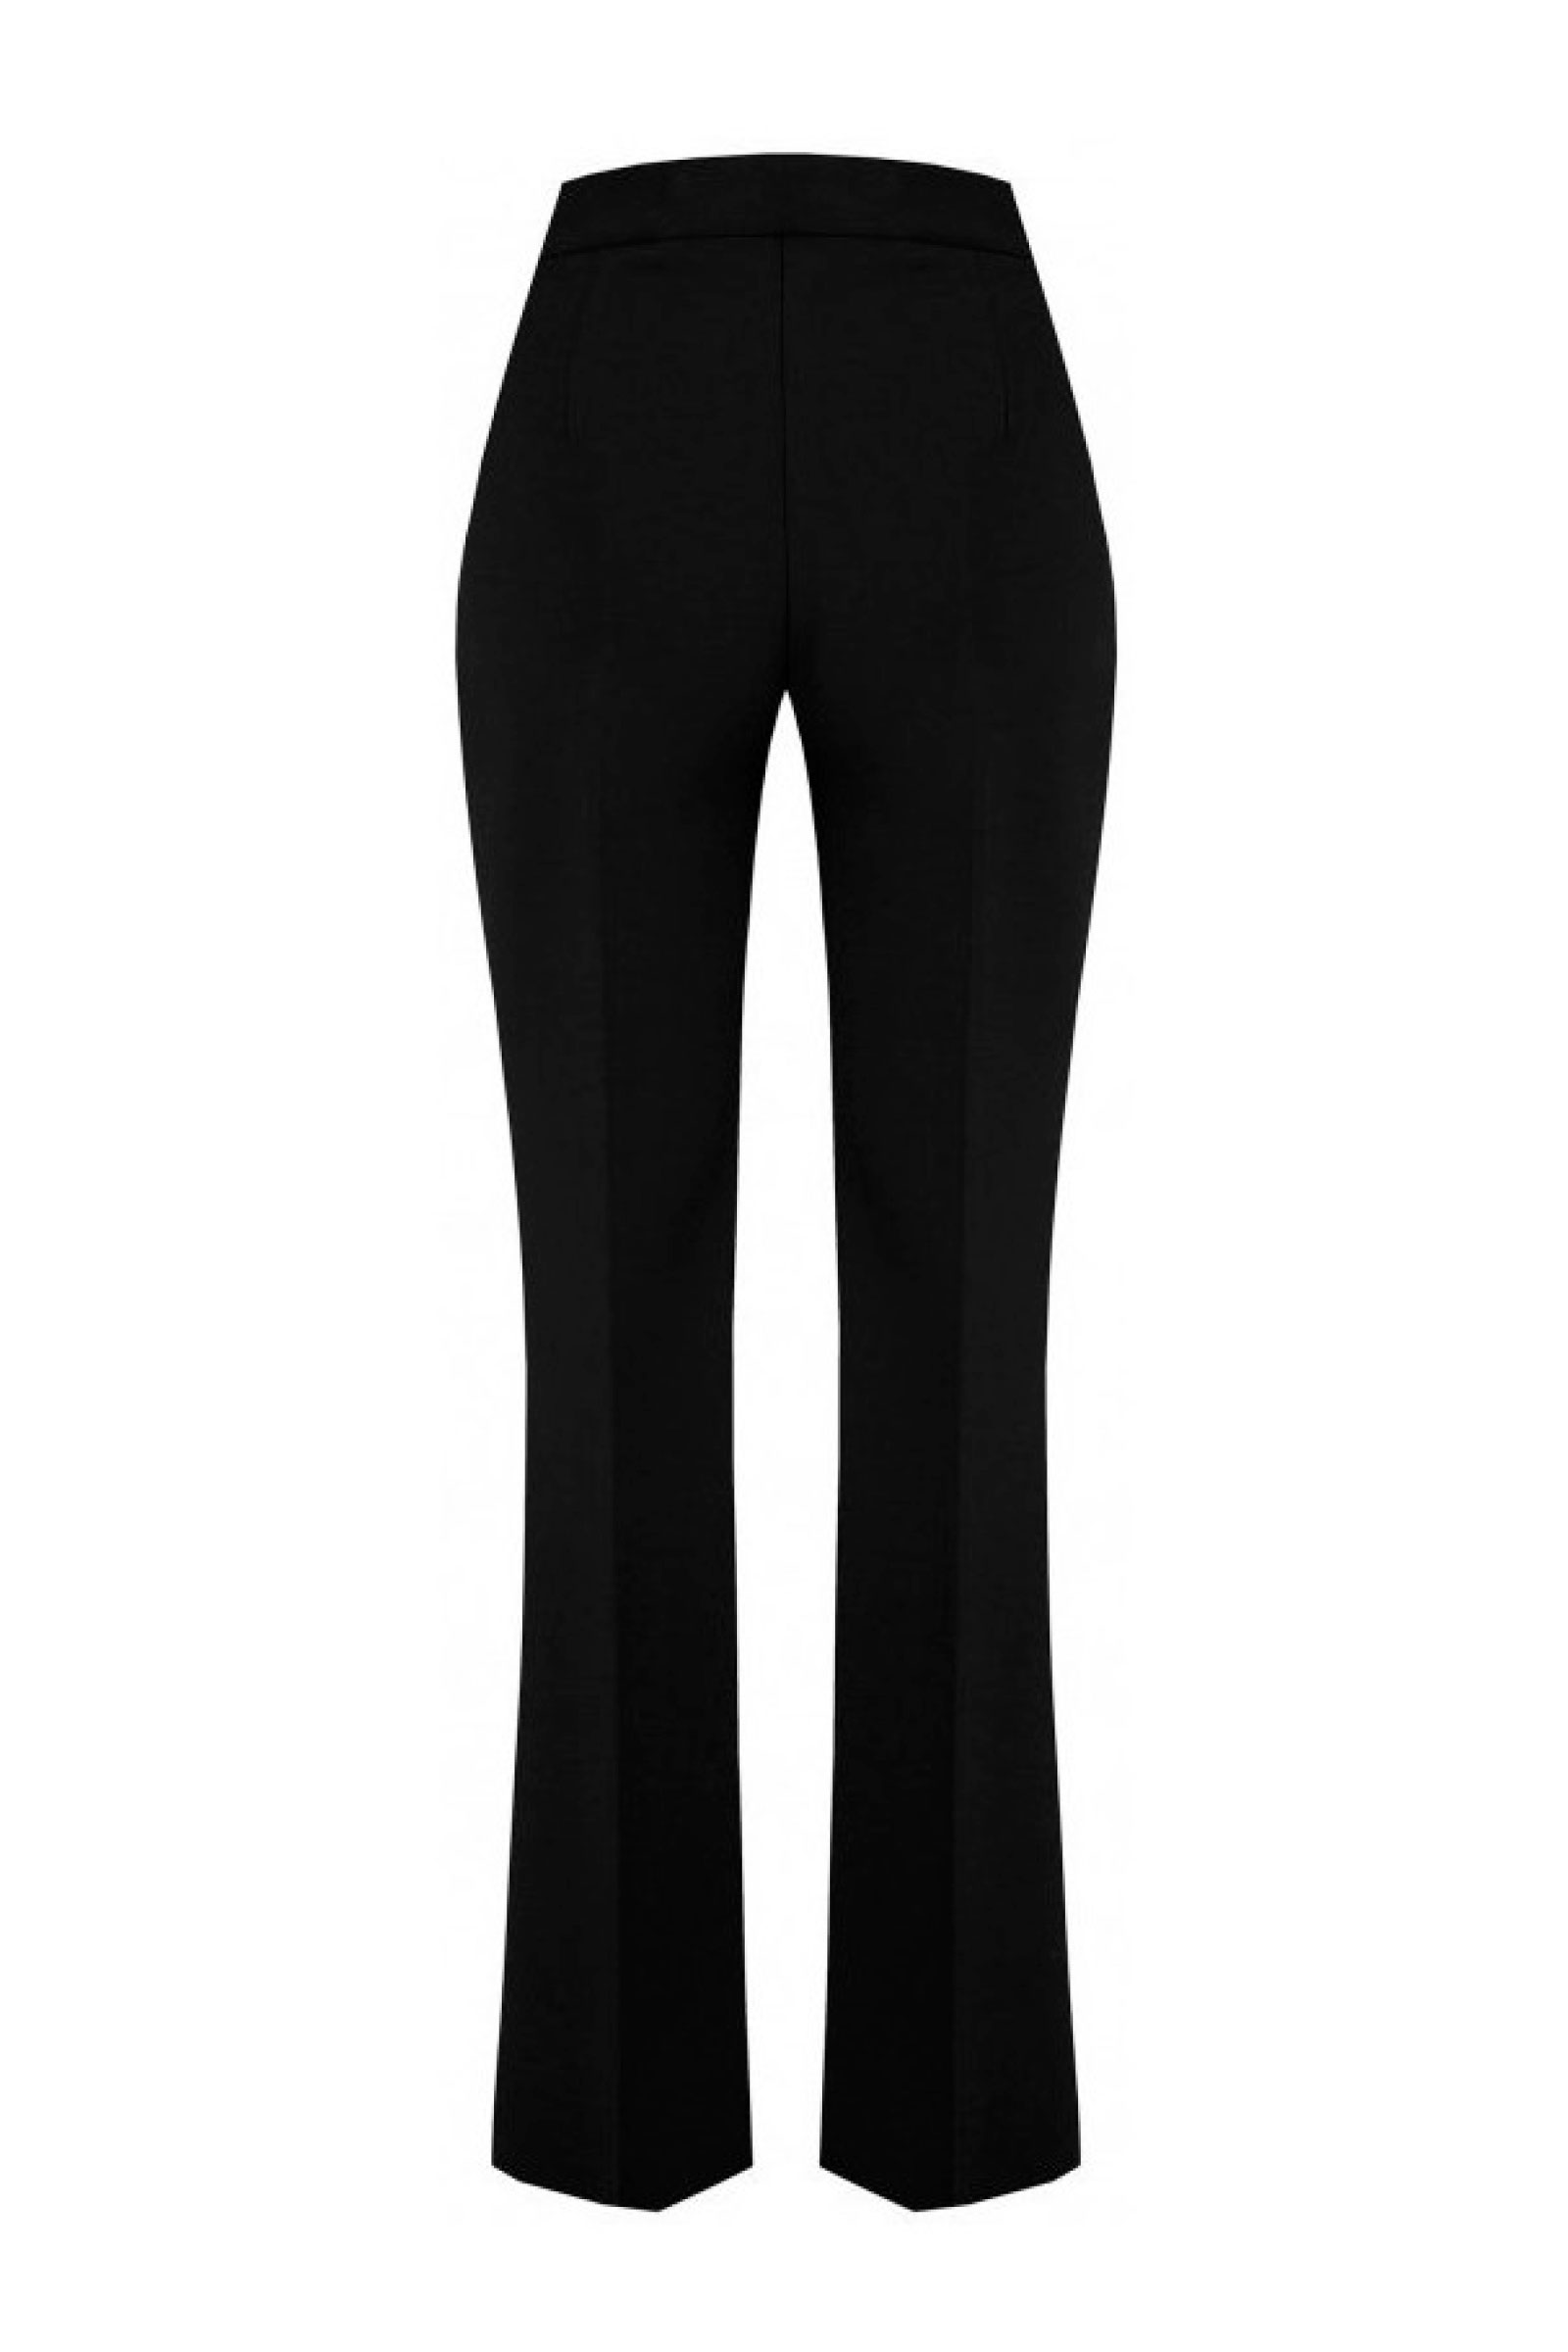 RINASCIMENTO | Trousers | CFC0102420003B001